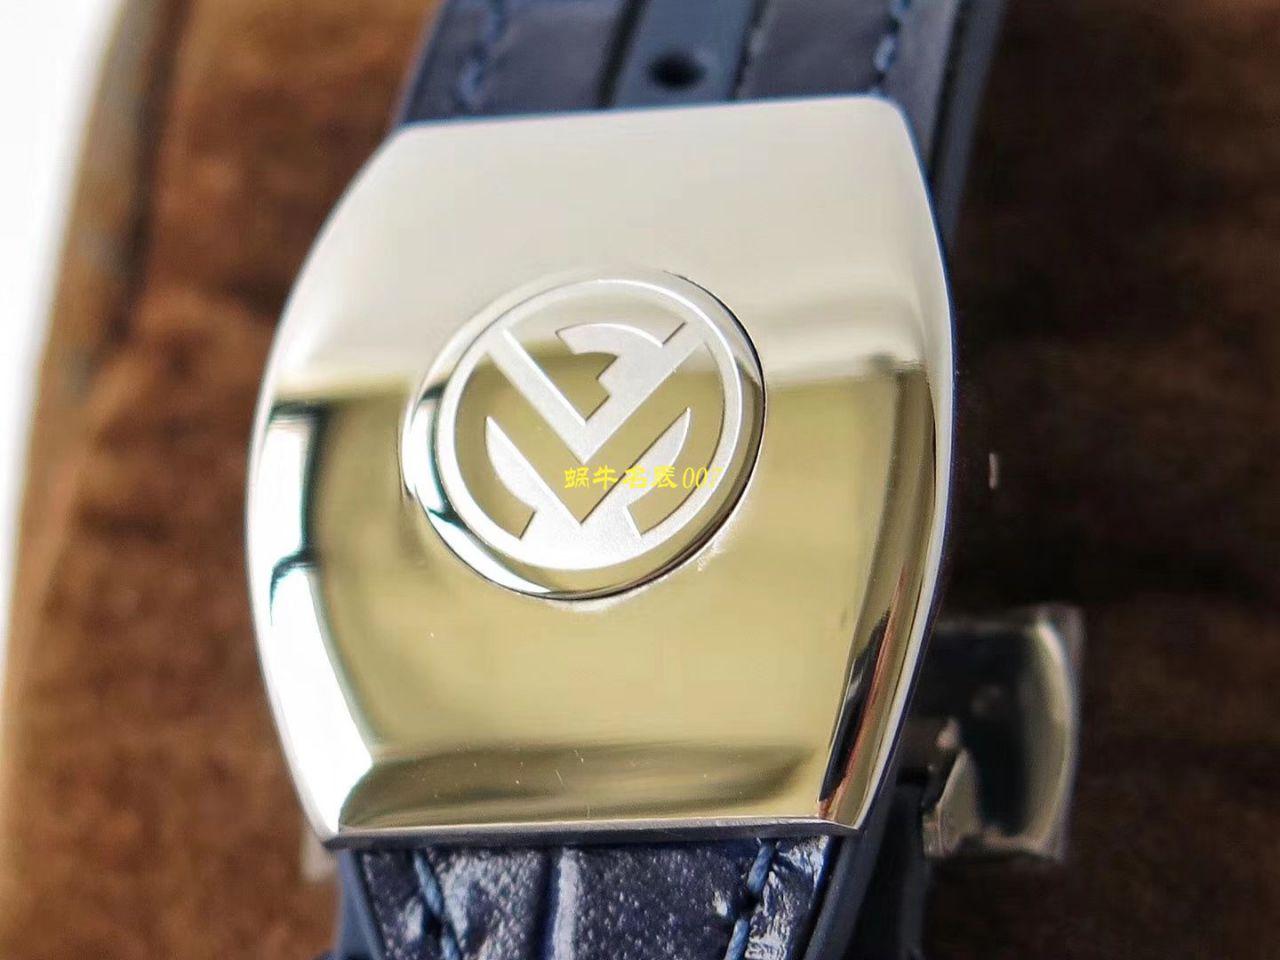 【台湾厂Franck Muller复刻手表】法兰克穆勒MEN'S COLLECTION系列V 45 CC DT YACHT腕表 / FL063